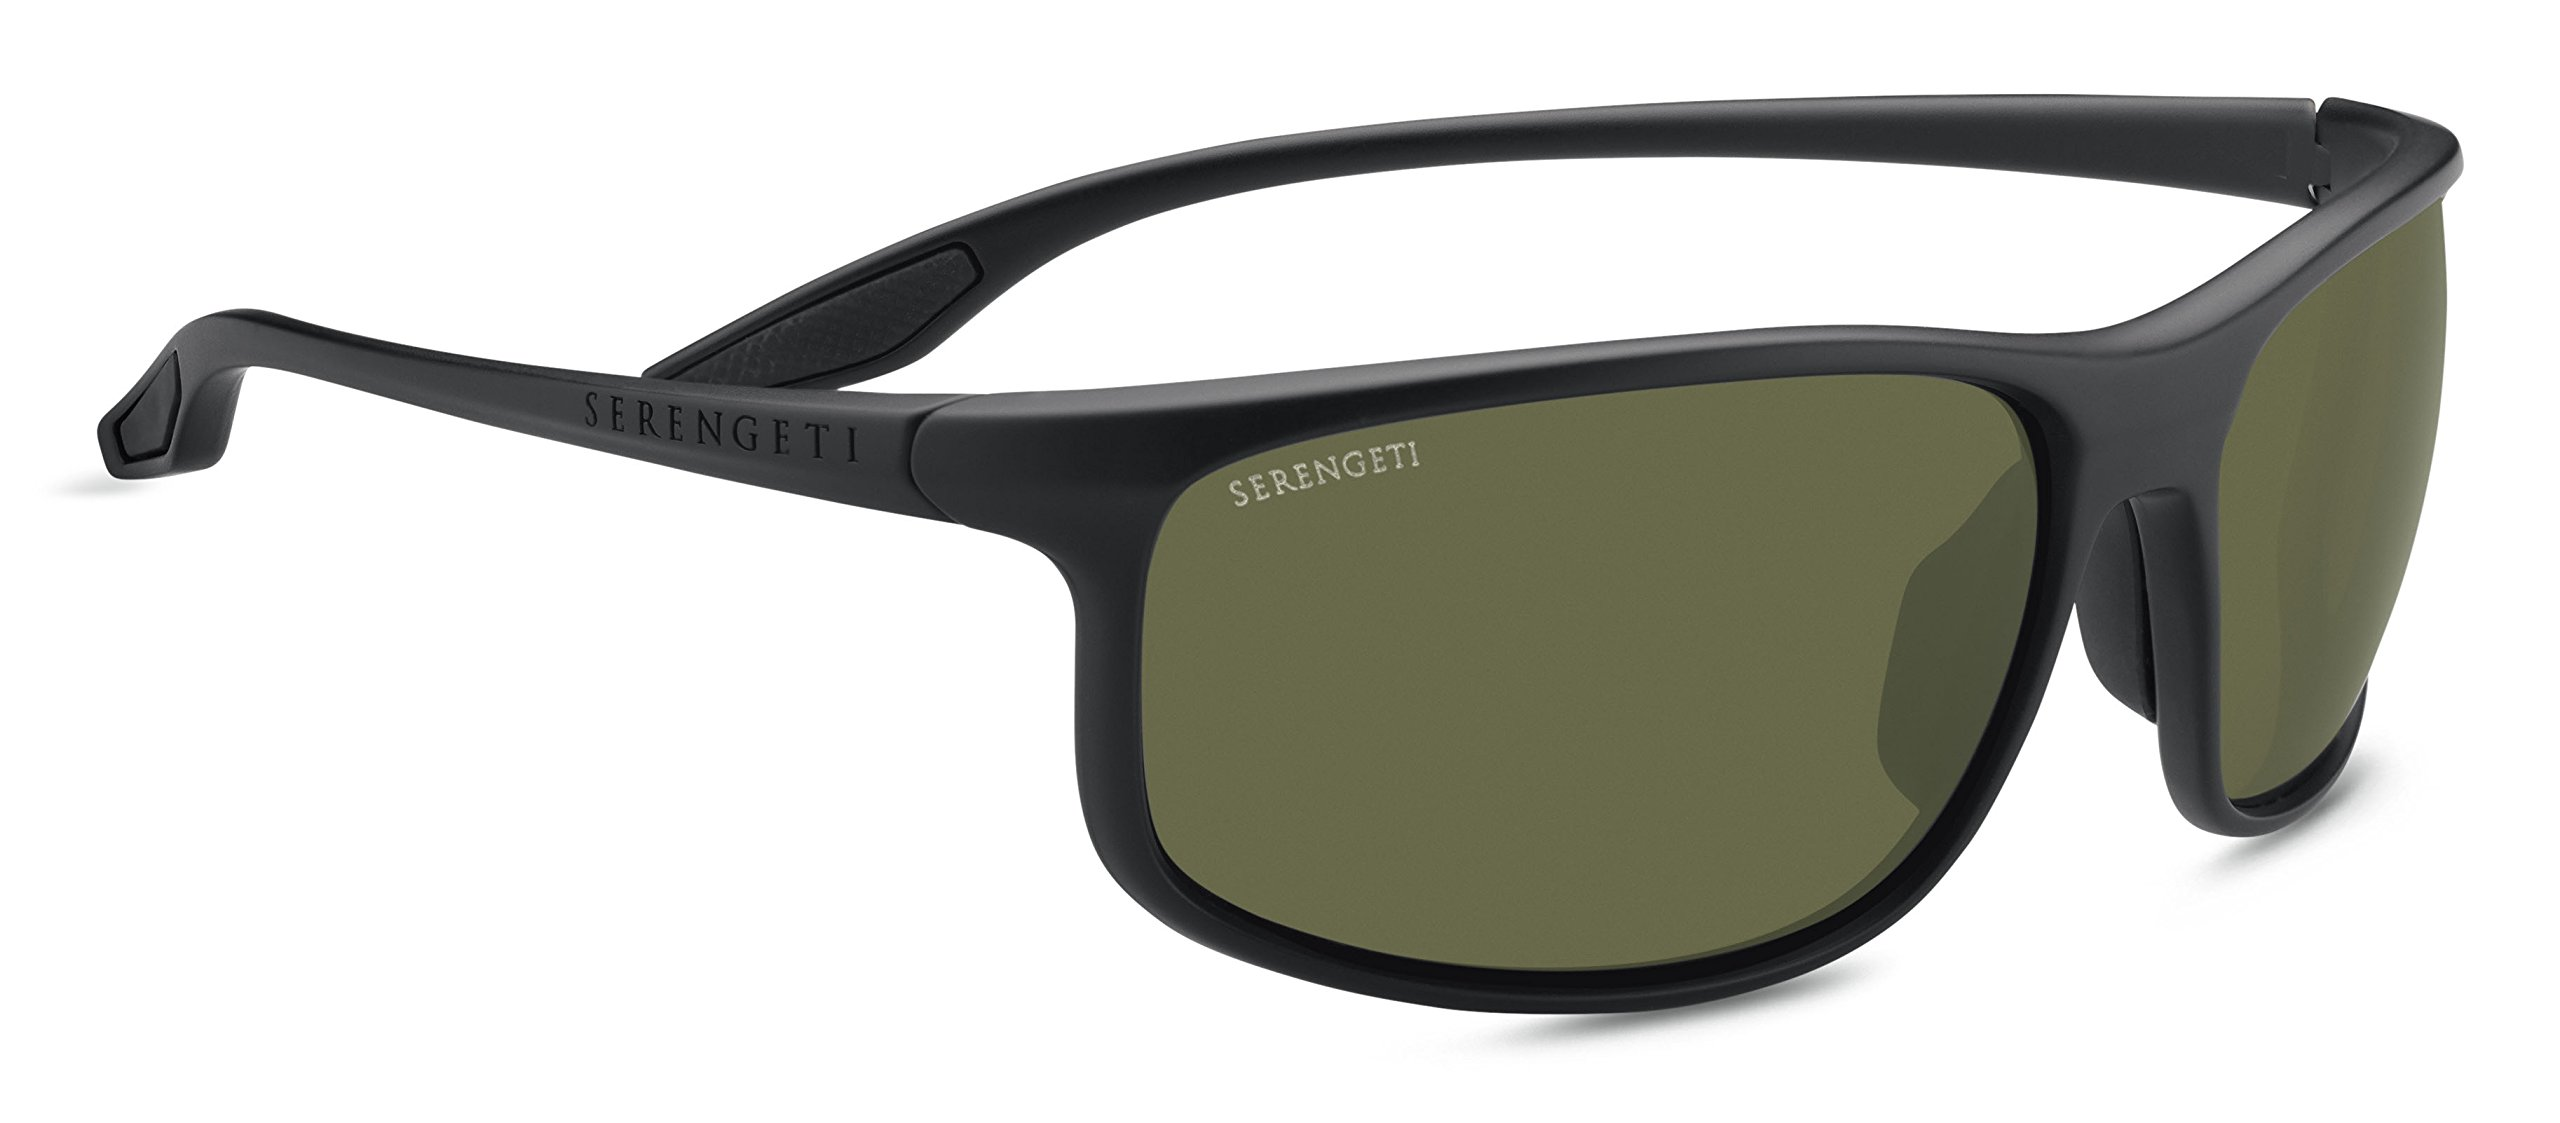 Serengeti Ponza Sunglasses Satin Black, Green